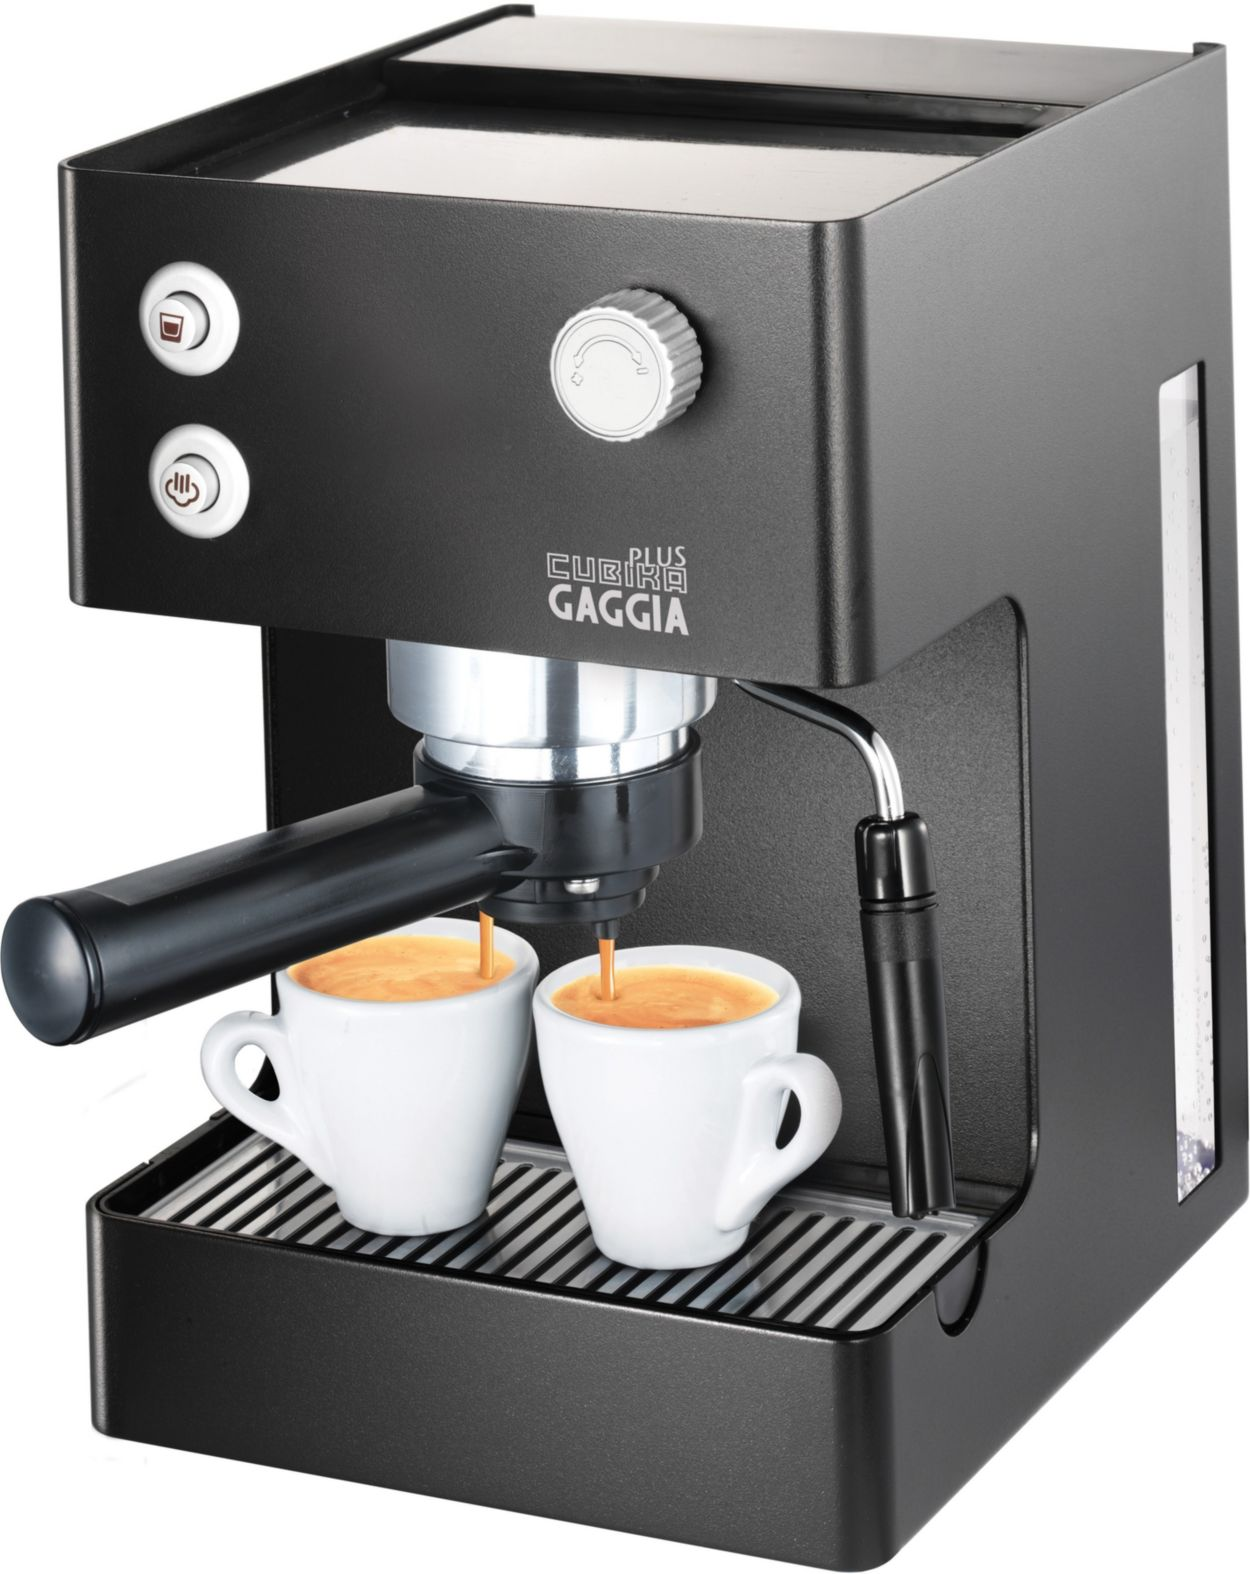 Electronic Classic Gaggia Coffee Machine manual espresso machine ri815160 gaggia compact yet efficient